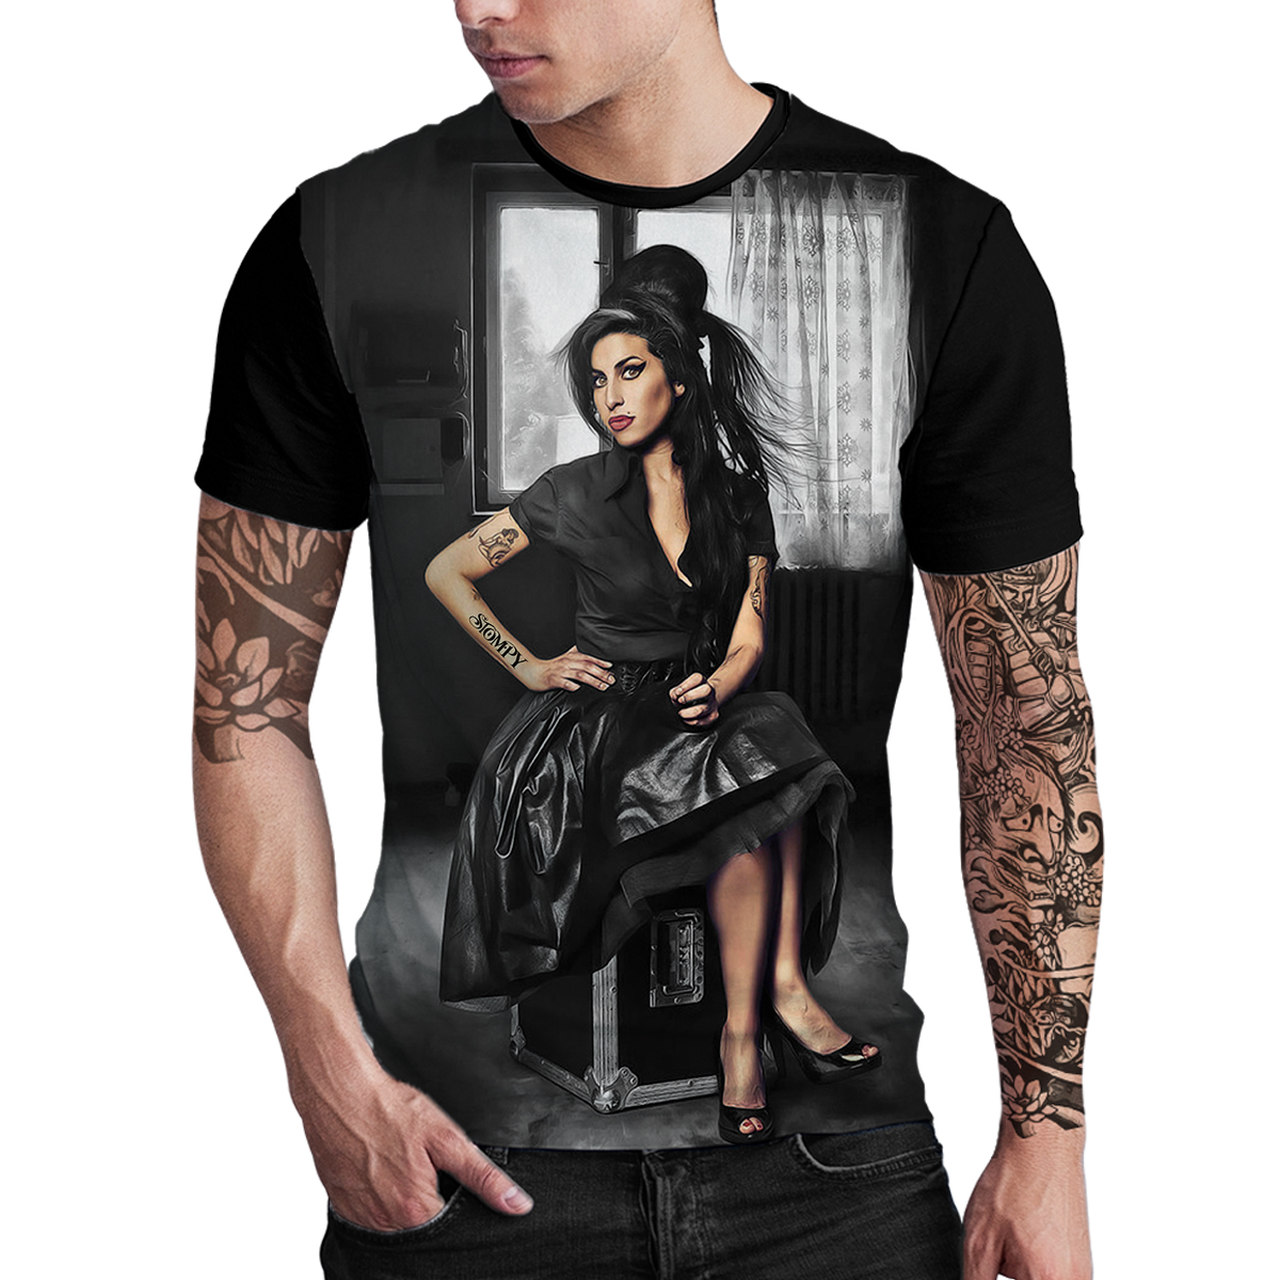 Stompy Camiseta Estampada Masculina Modelo 18